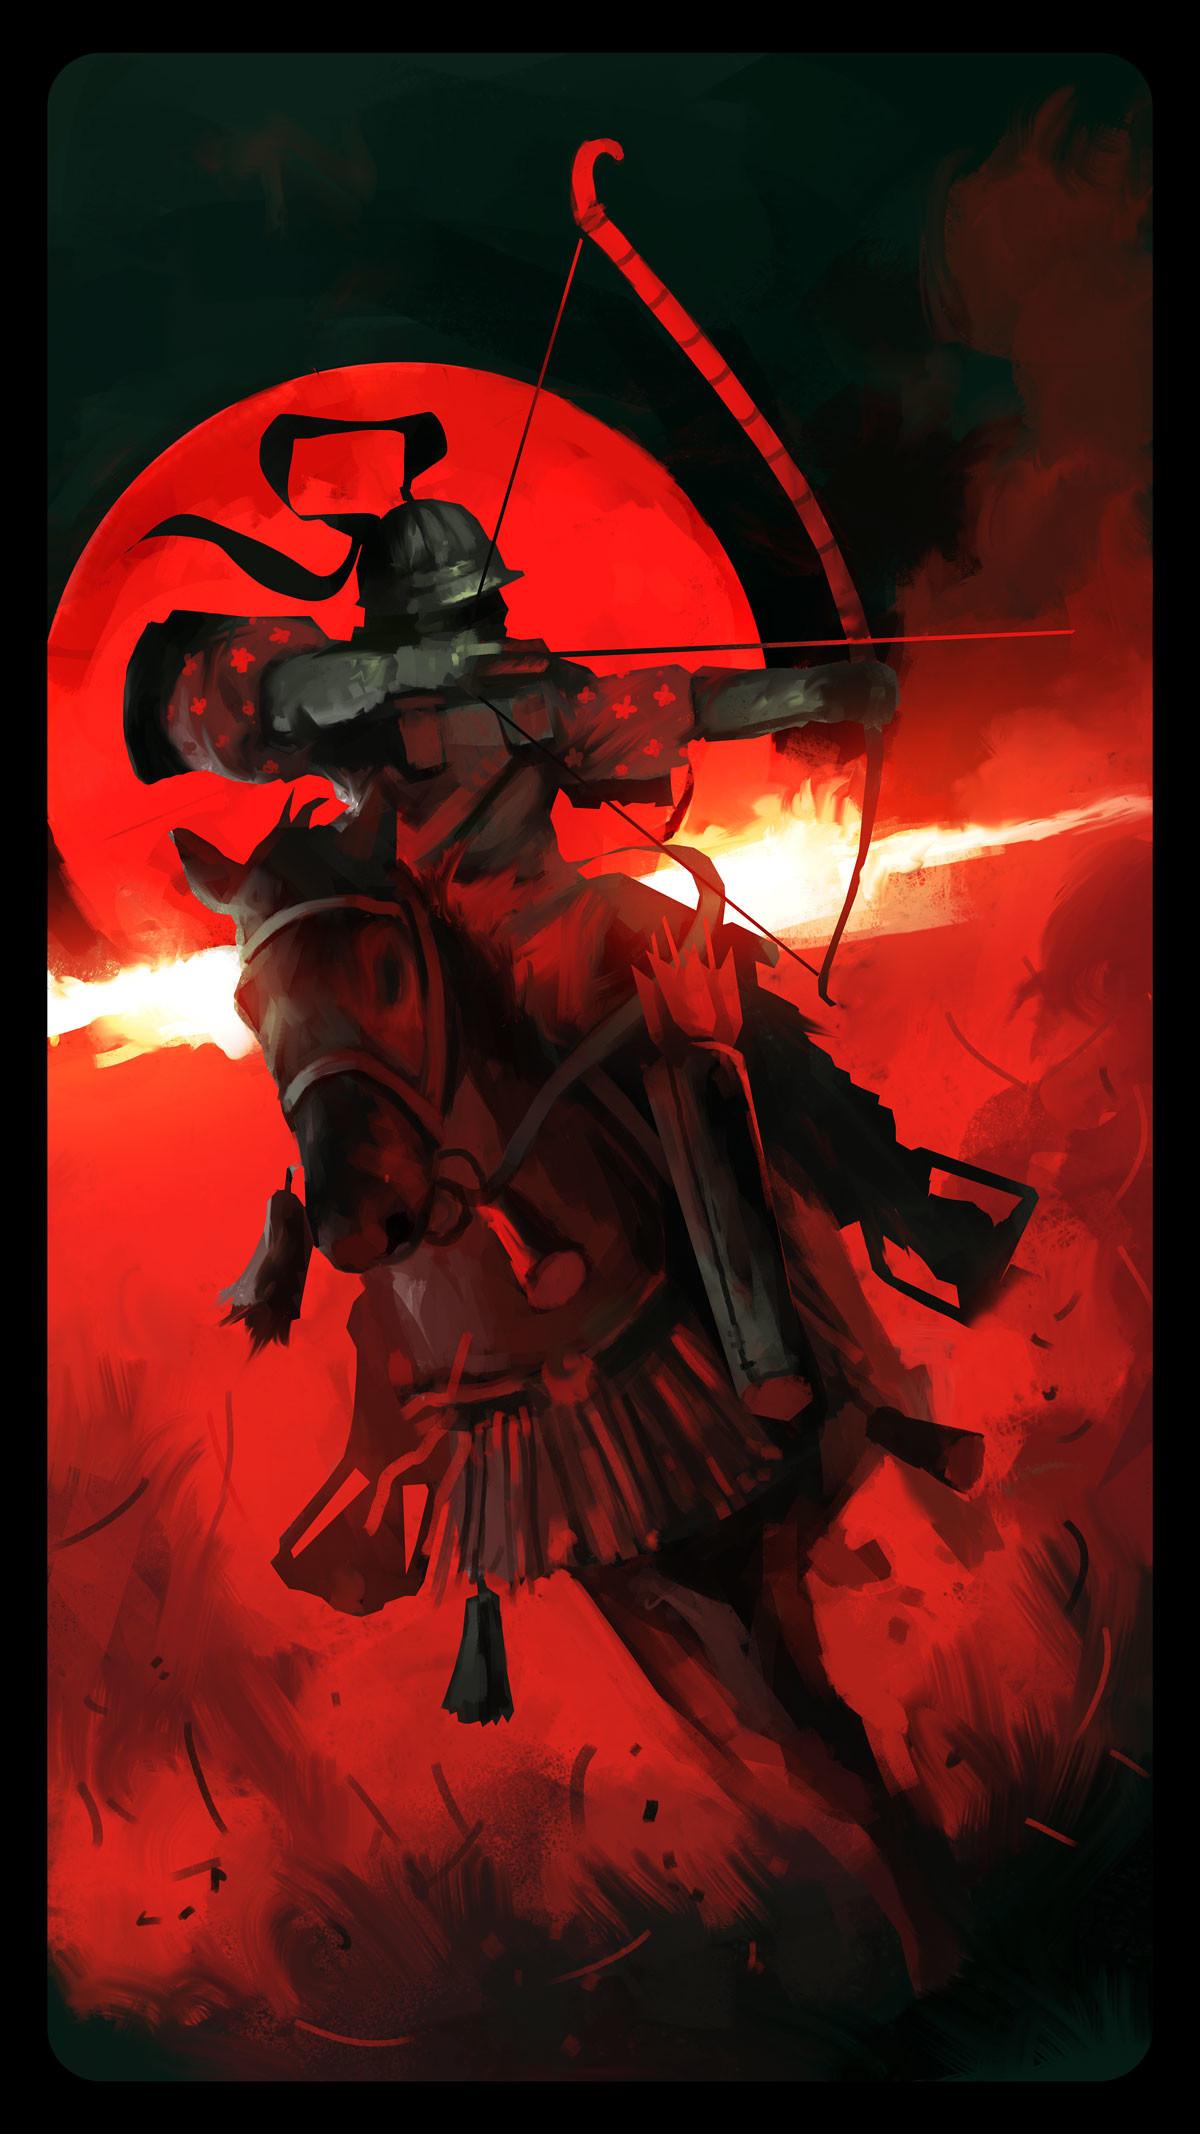 Dominik mayer samurai archer front render 01